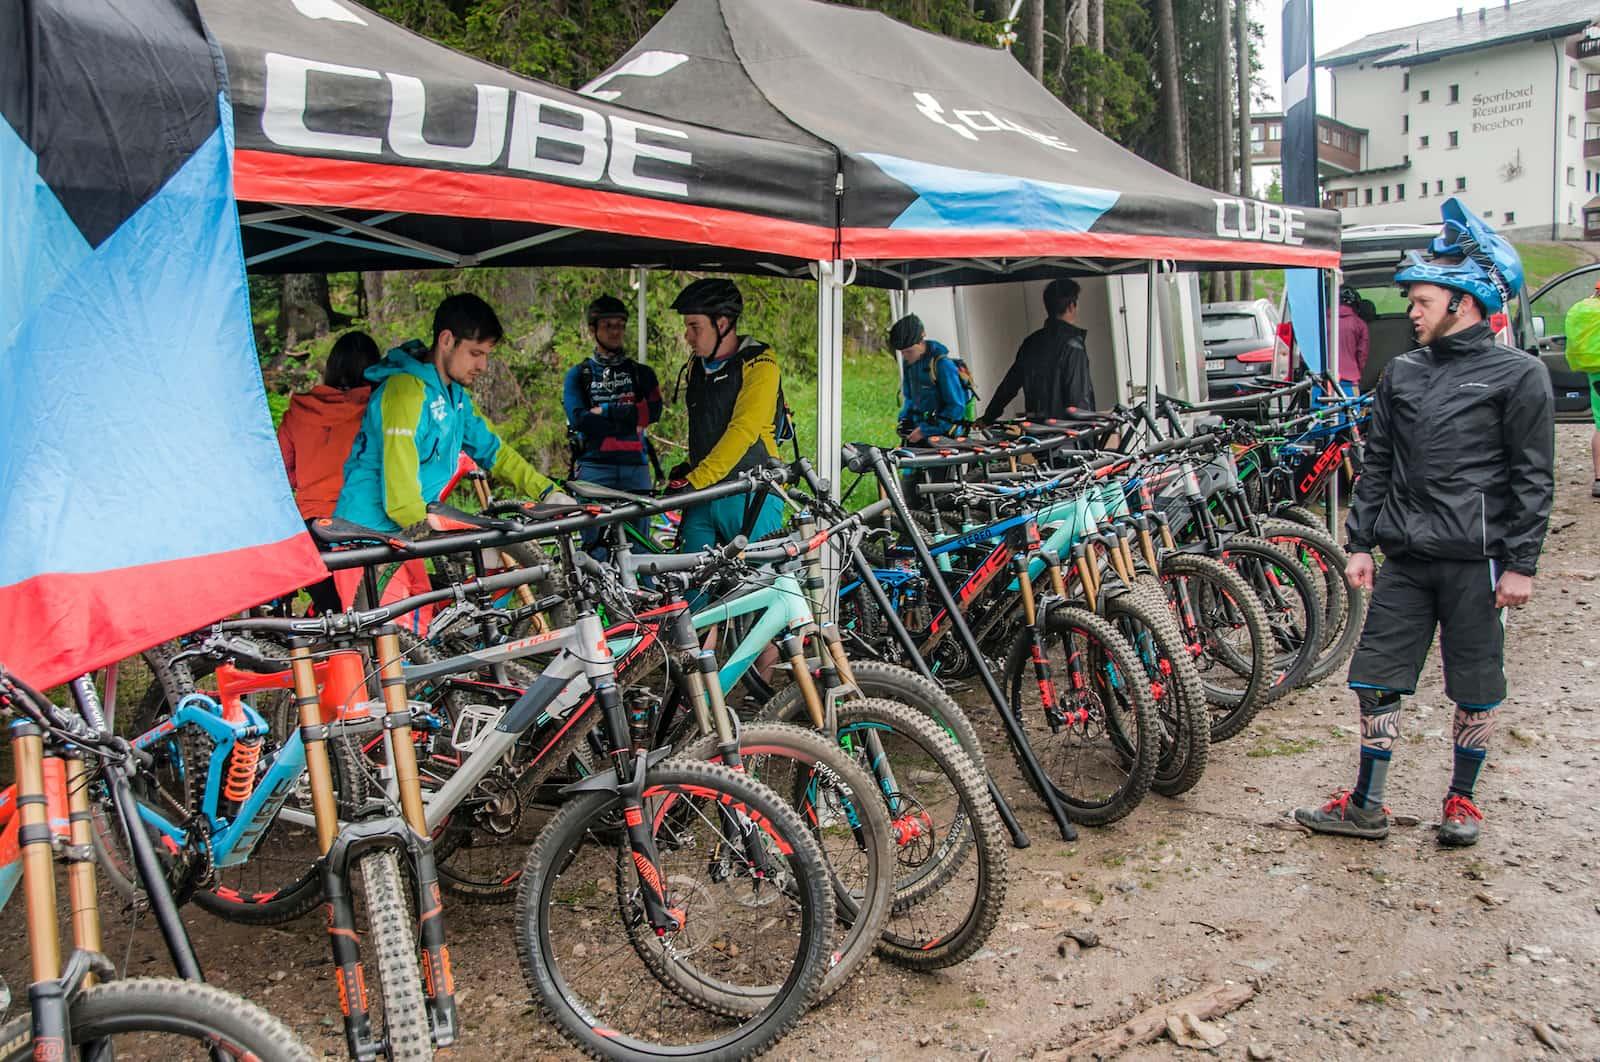 Sportpark Aare-Rhein Bikes Cube